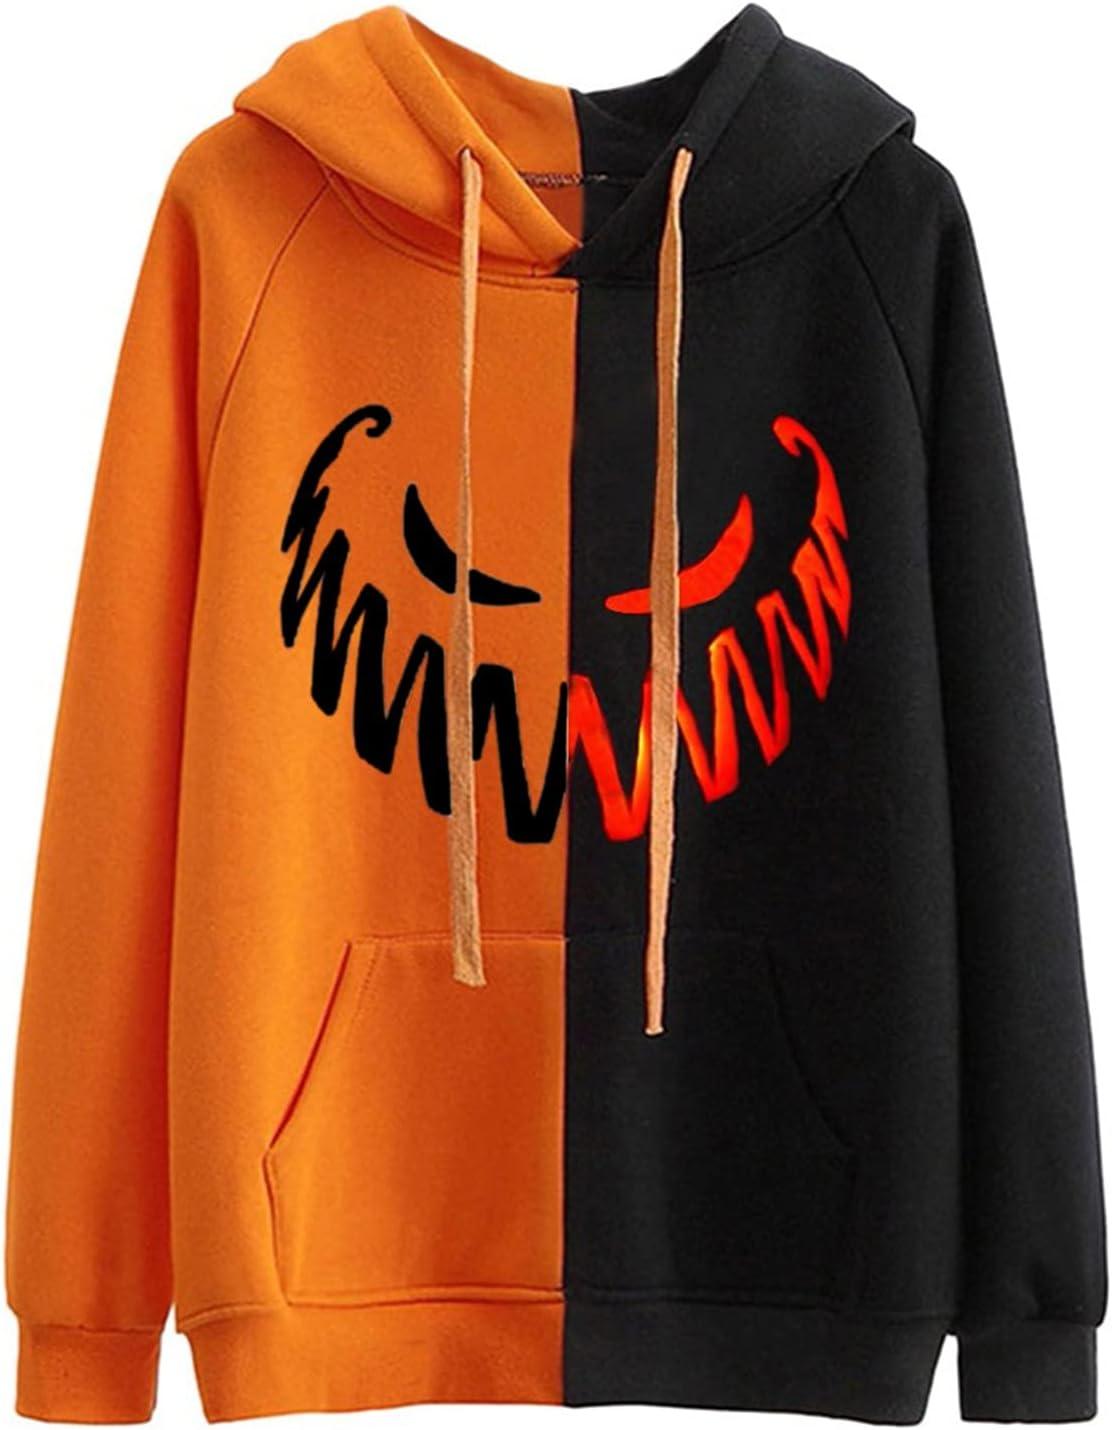 Fullwei Sweatshirt for Women Graphi Halloween Soldering Cute OFFicial Pumpkin